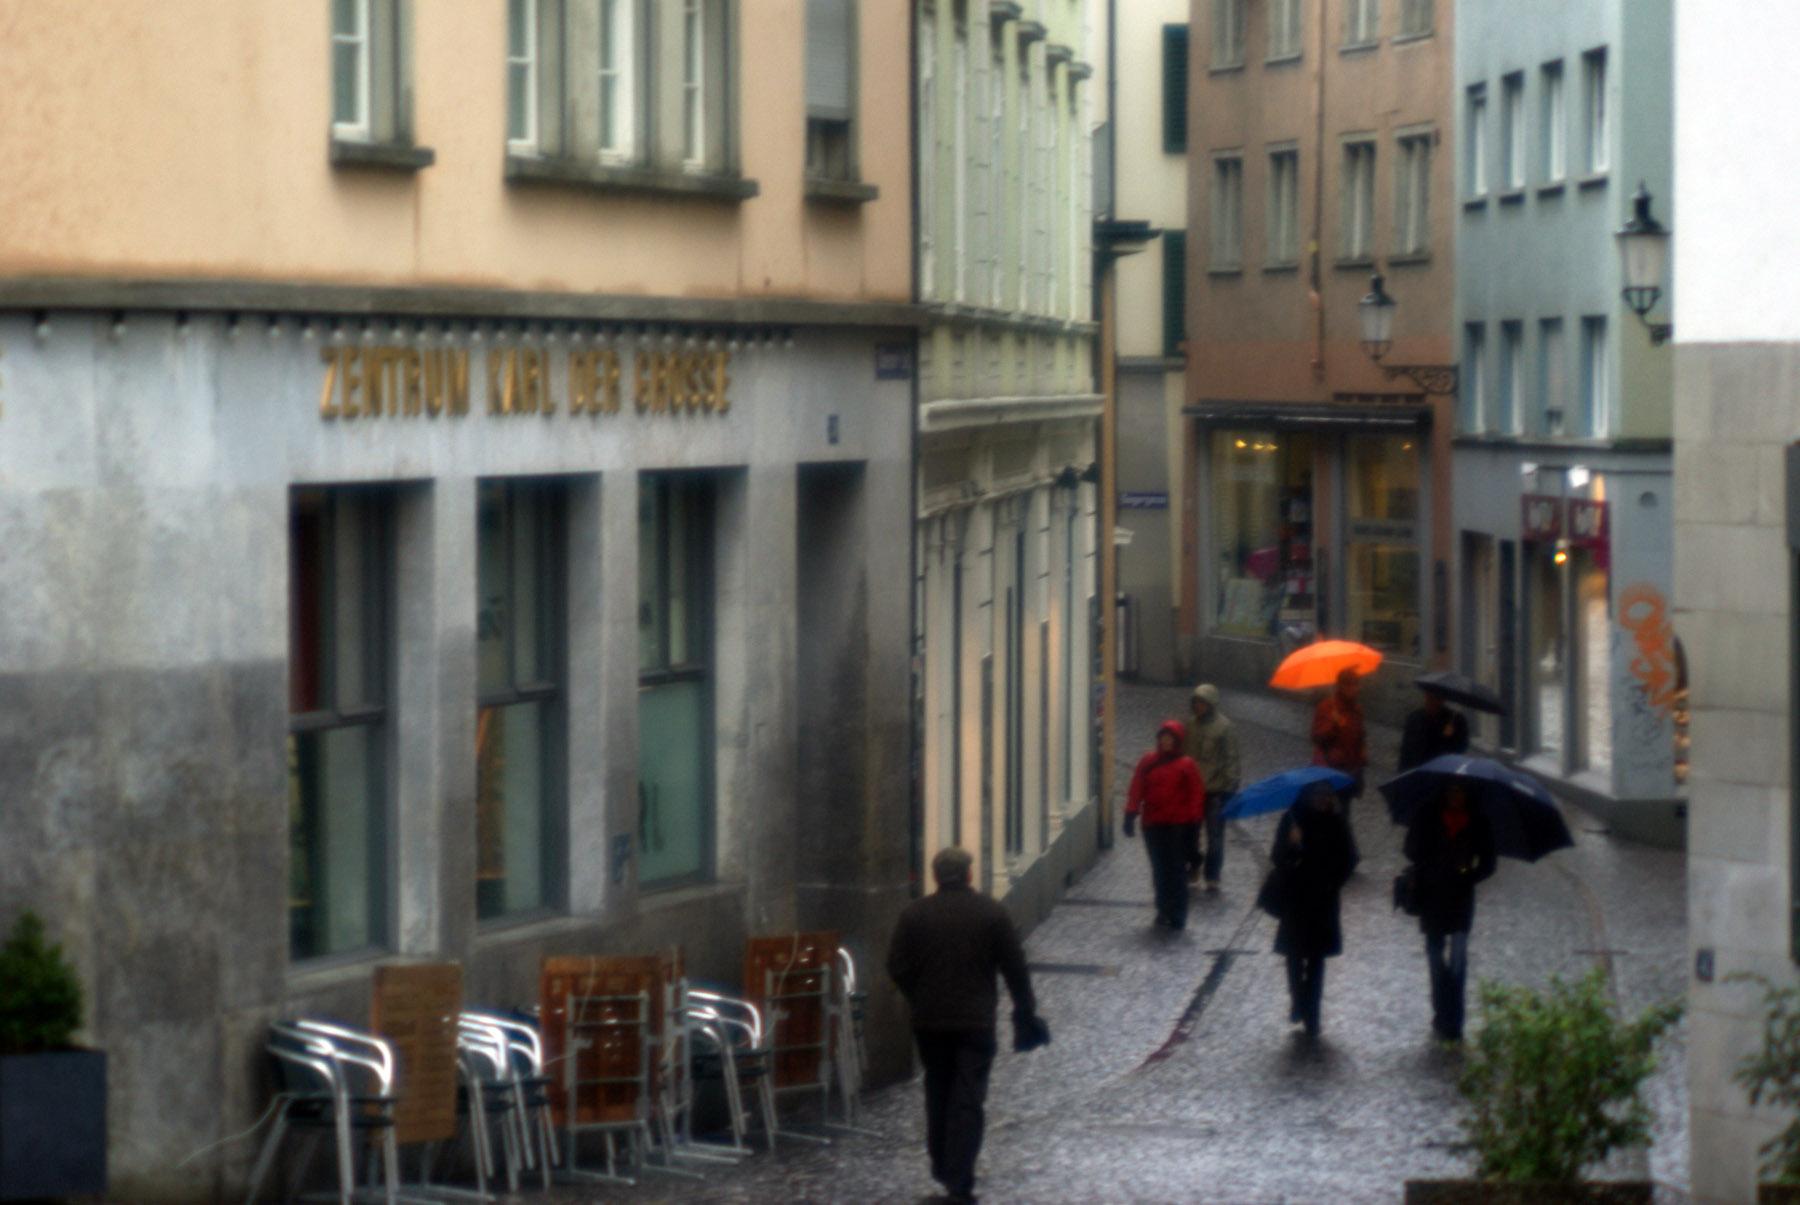 orangeumbrella.jpg